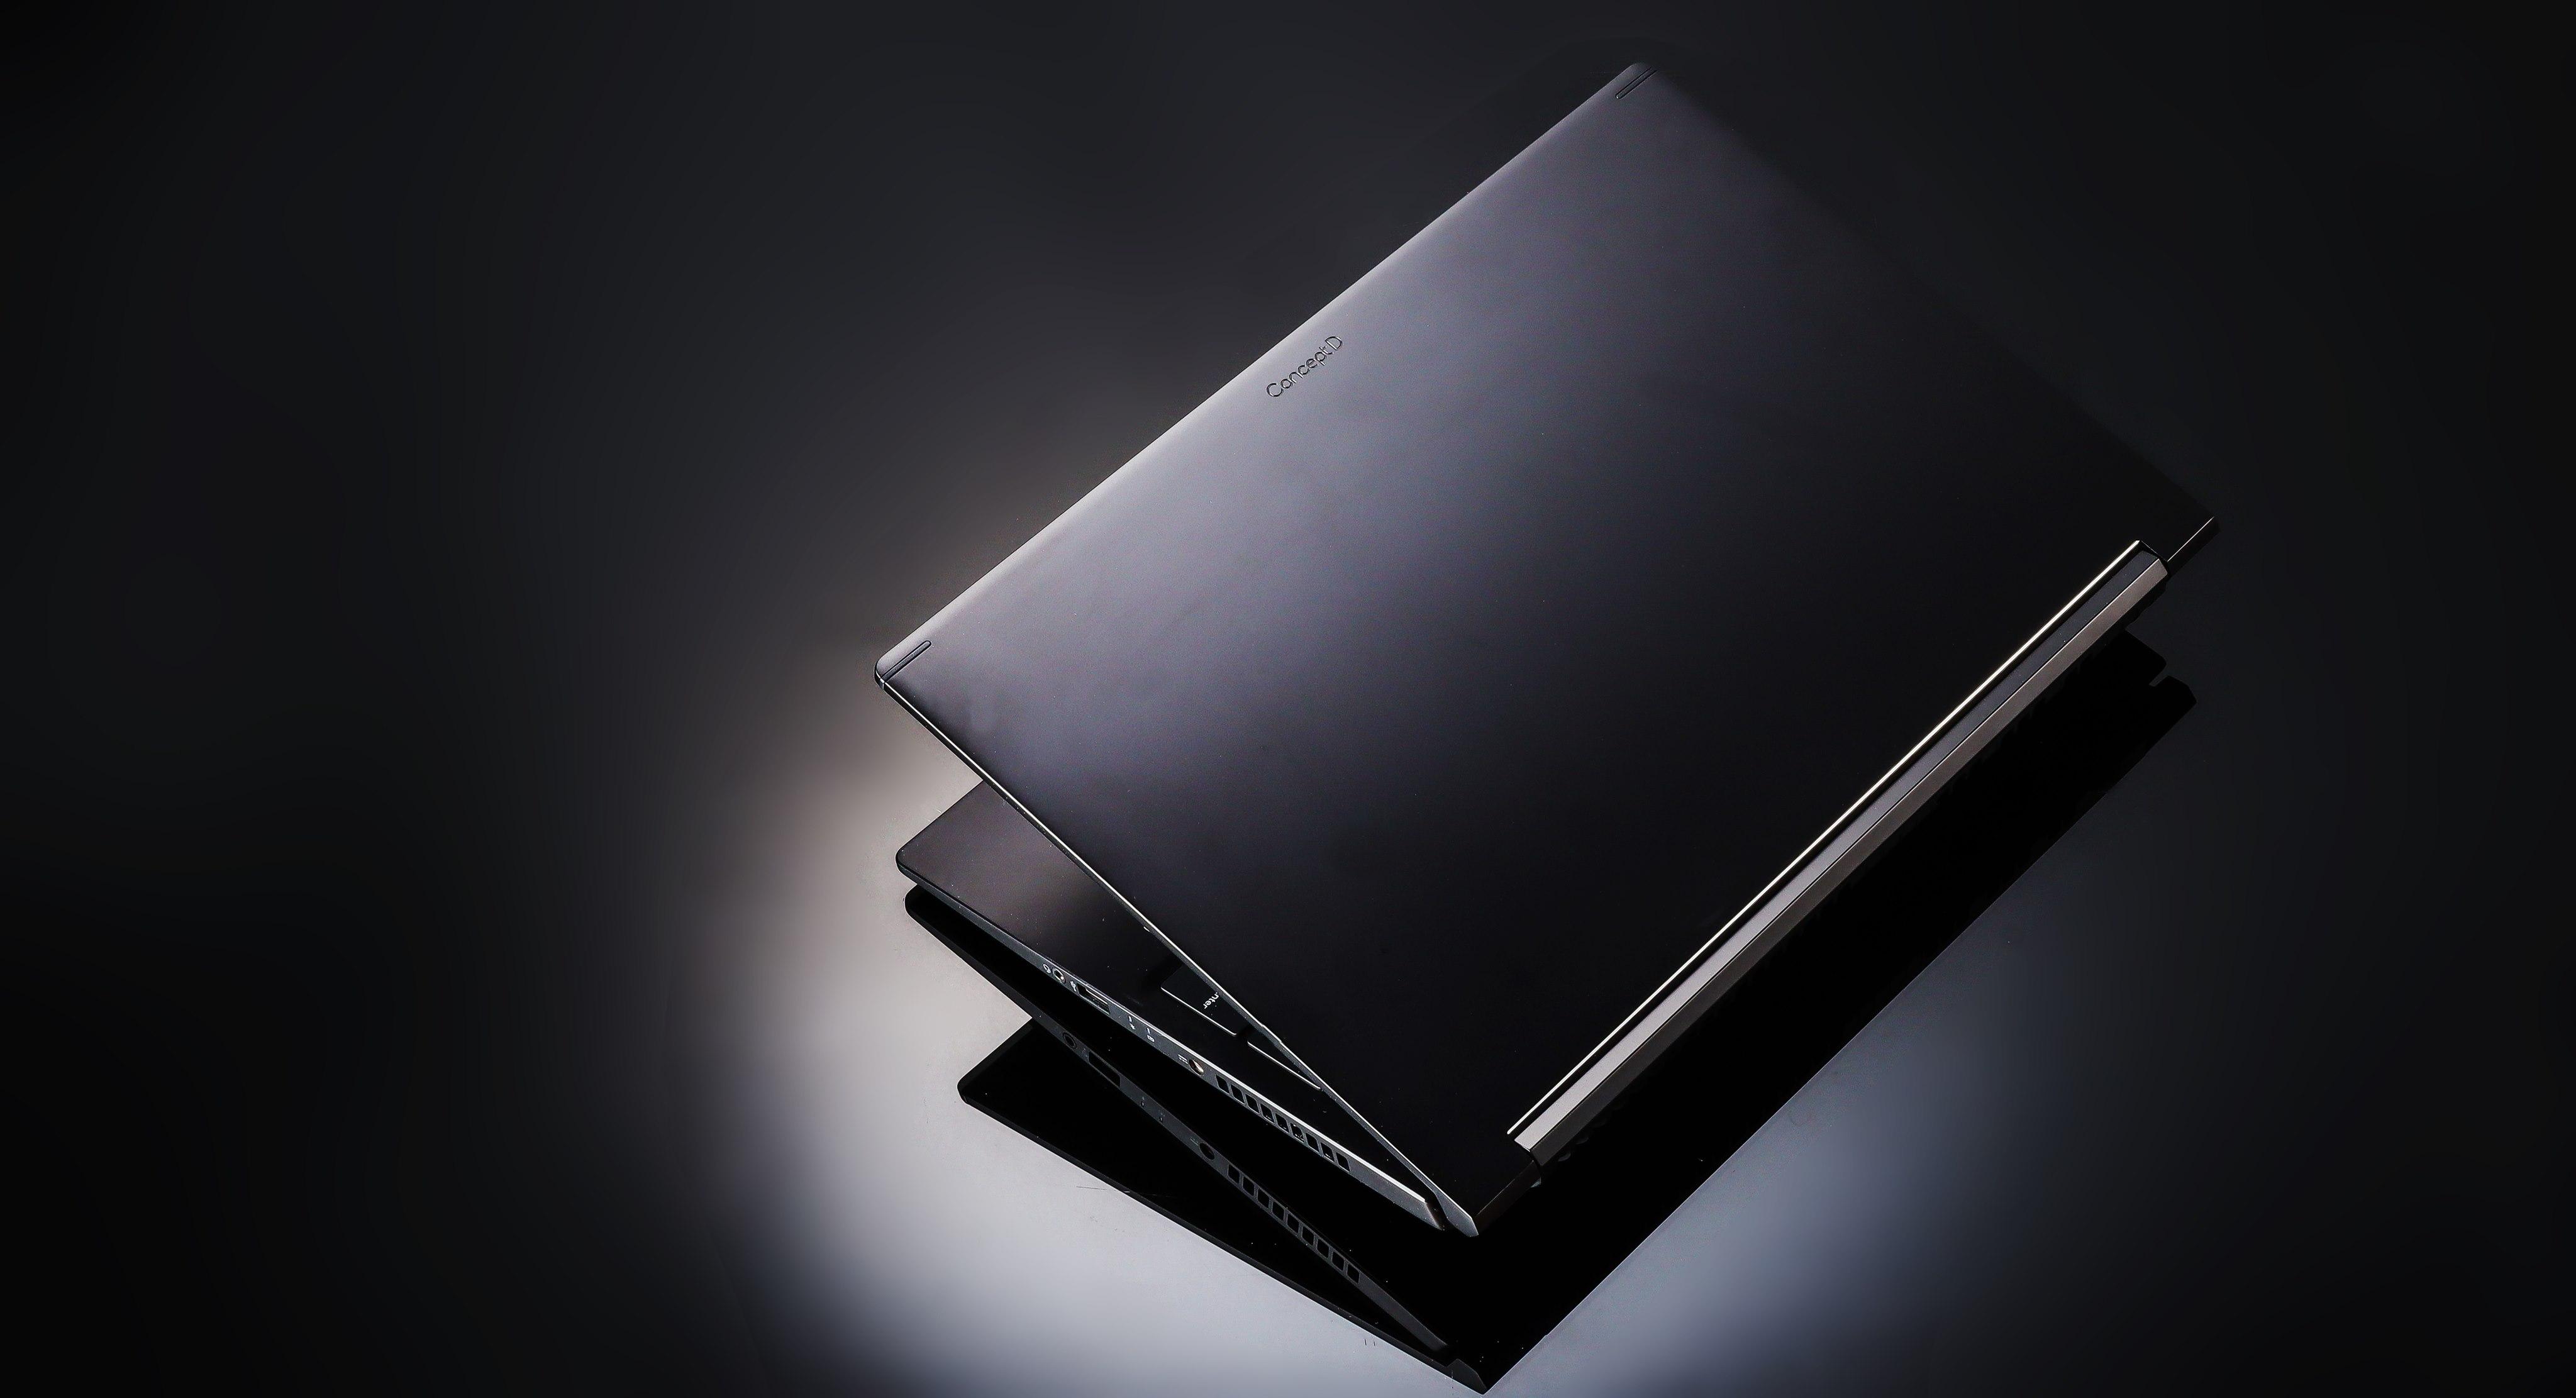 Acer ConceptD 3 Pro 評測:搭載 NVIDIA Quadro GPU 的創作者筆電,鎖定設計師、YouTuber、直播主